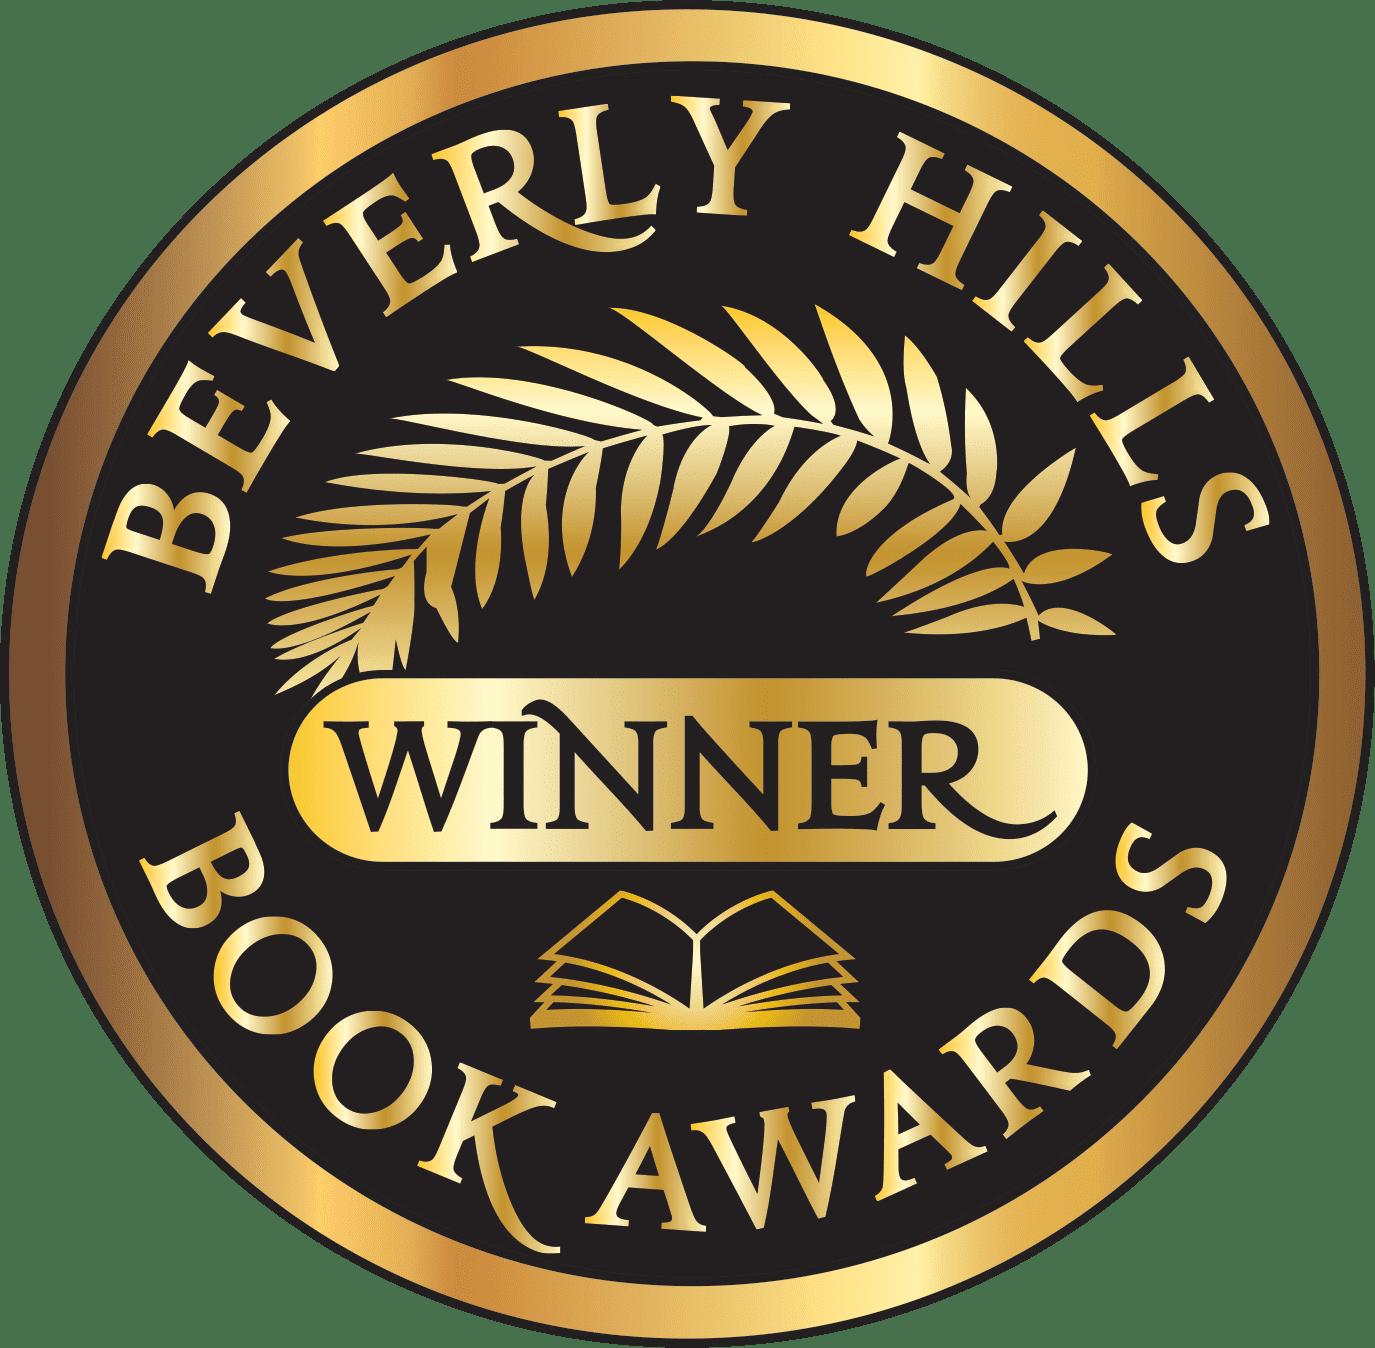 23-231535_beverly-hills-book-awards